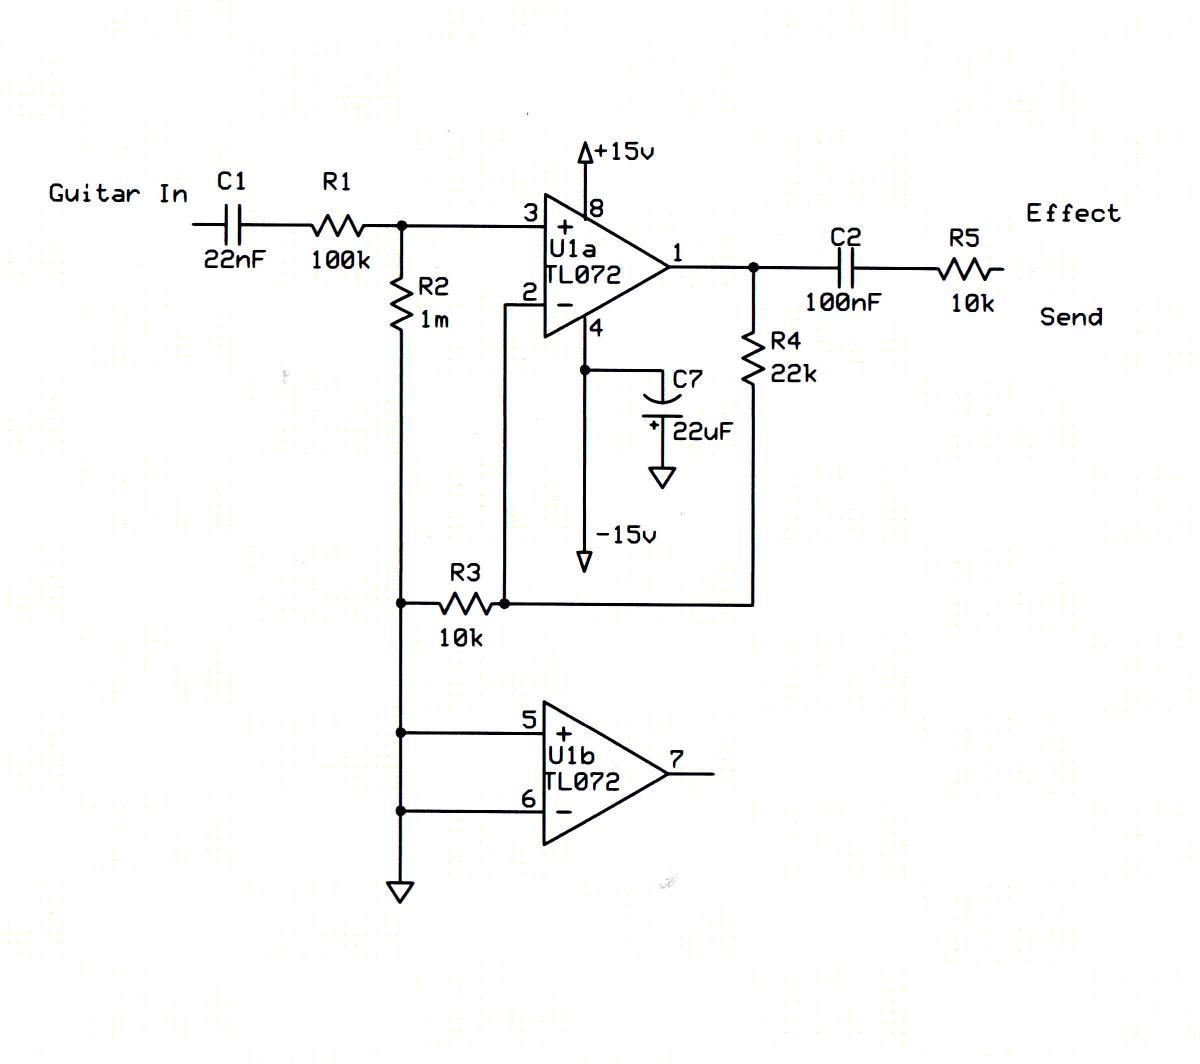 line 6 circuit diagram smart wiring diagrams u2022 rh emgsolutions co Electronic Circuit Diagrams line 6 spider iii circuit diagram